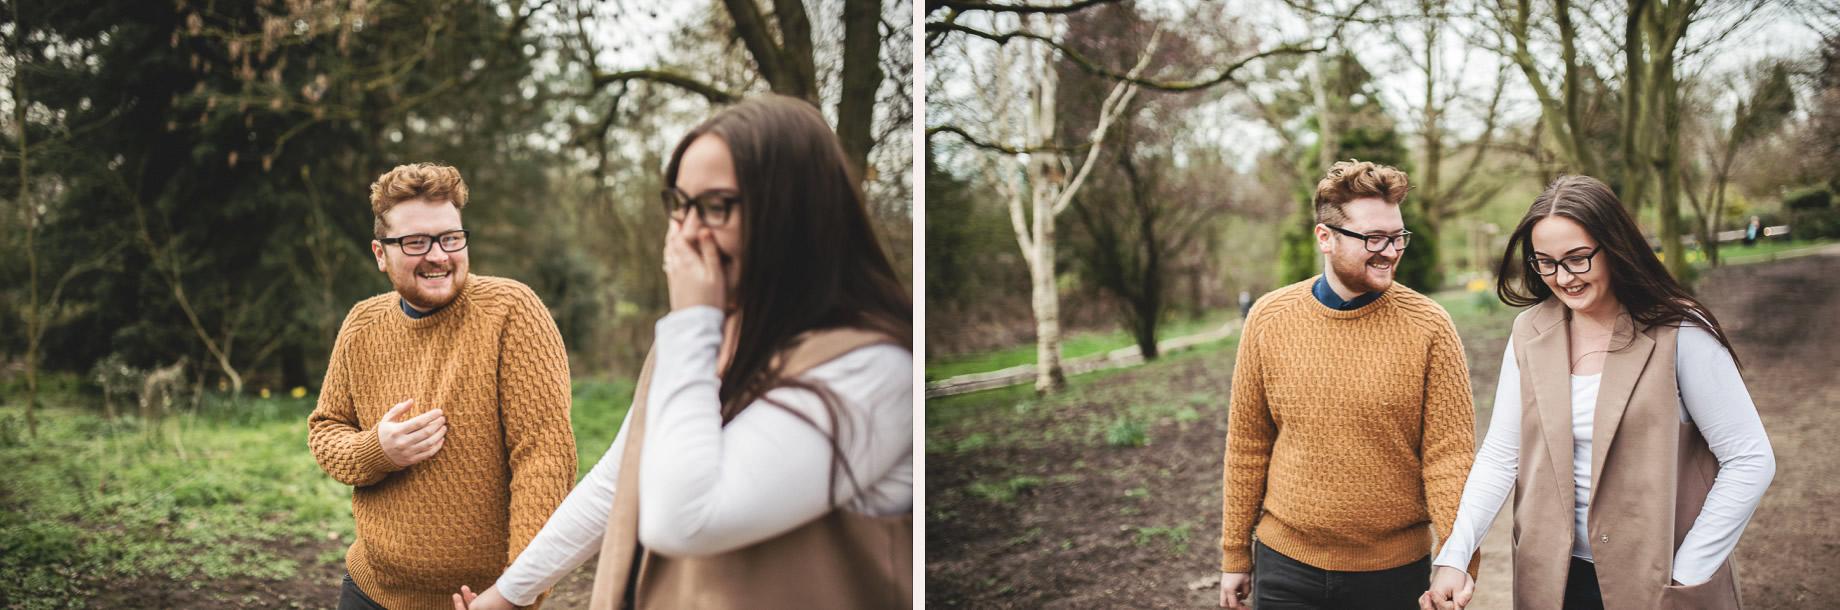 Kerrie and Tom's Portrait Shoot at Fletcher Moss Botanical Gardens 002